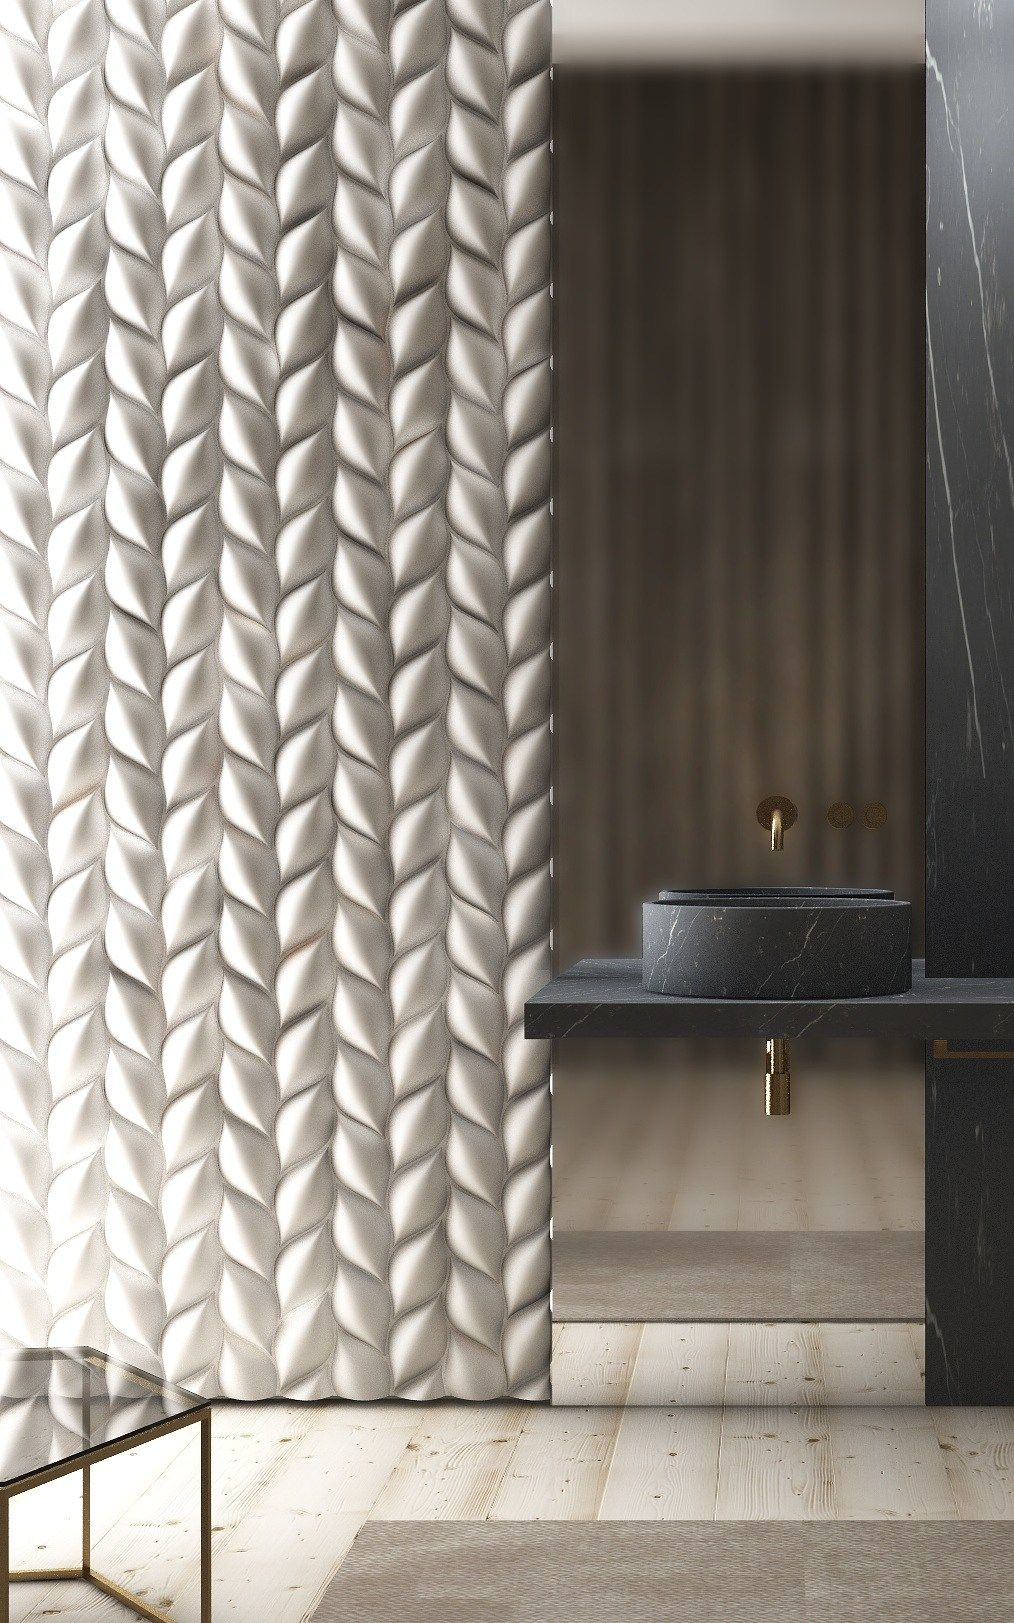 3d Wall Panel Treccia 3dsurface Bathroom Design